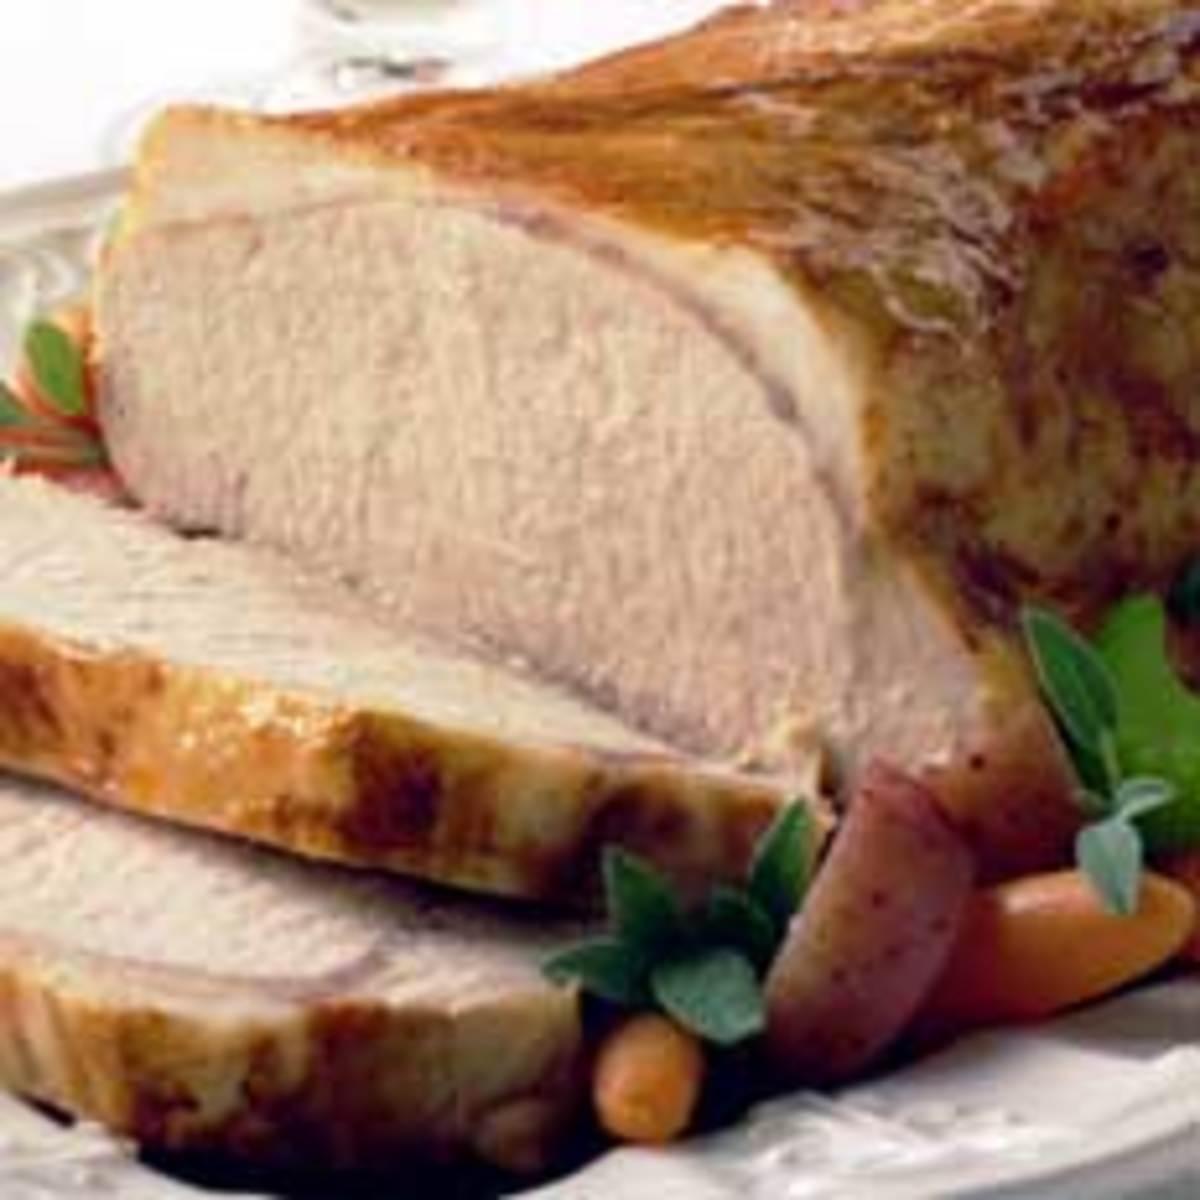 How to Prepare Pork Roast With Bacon, Mushroom Gravy